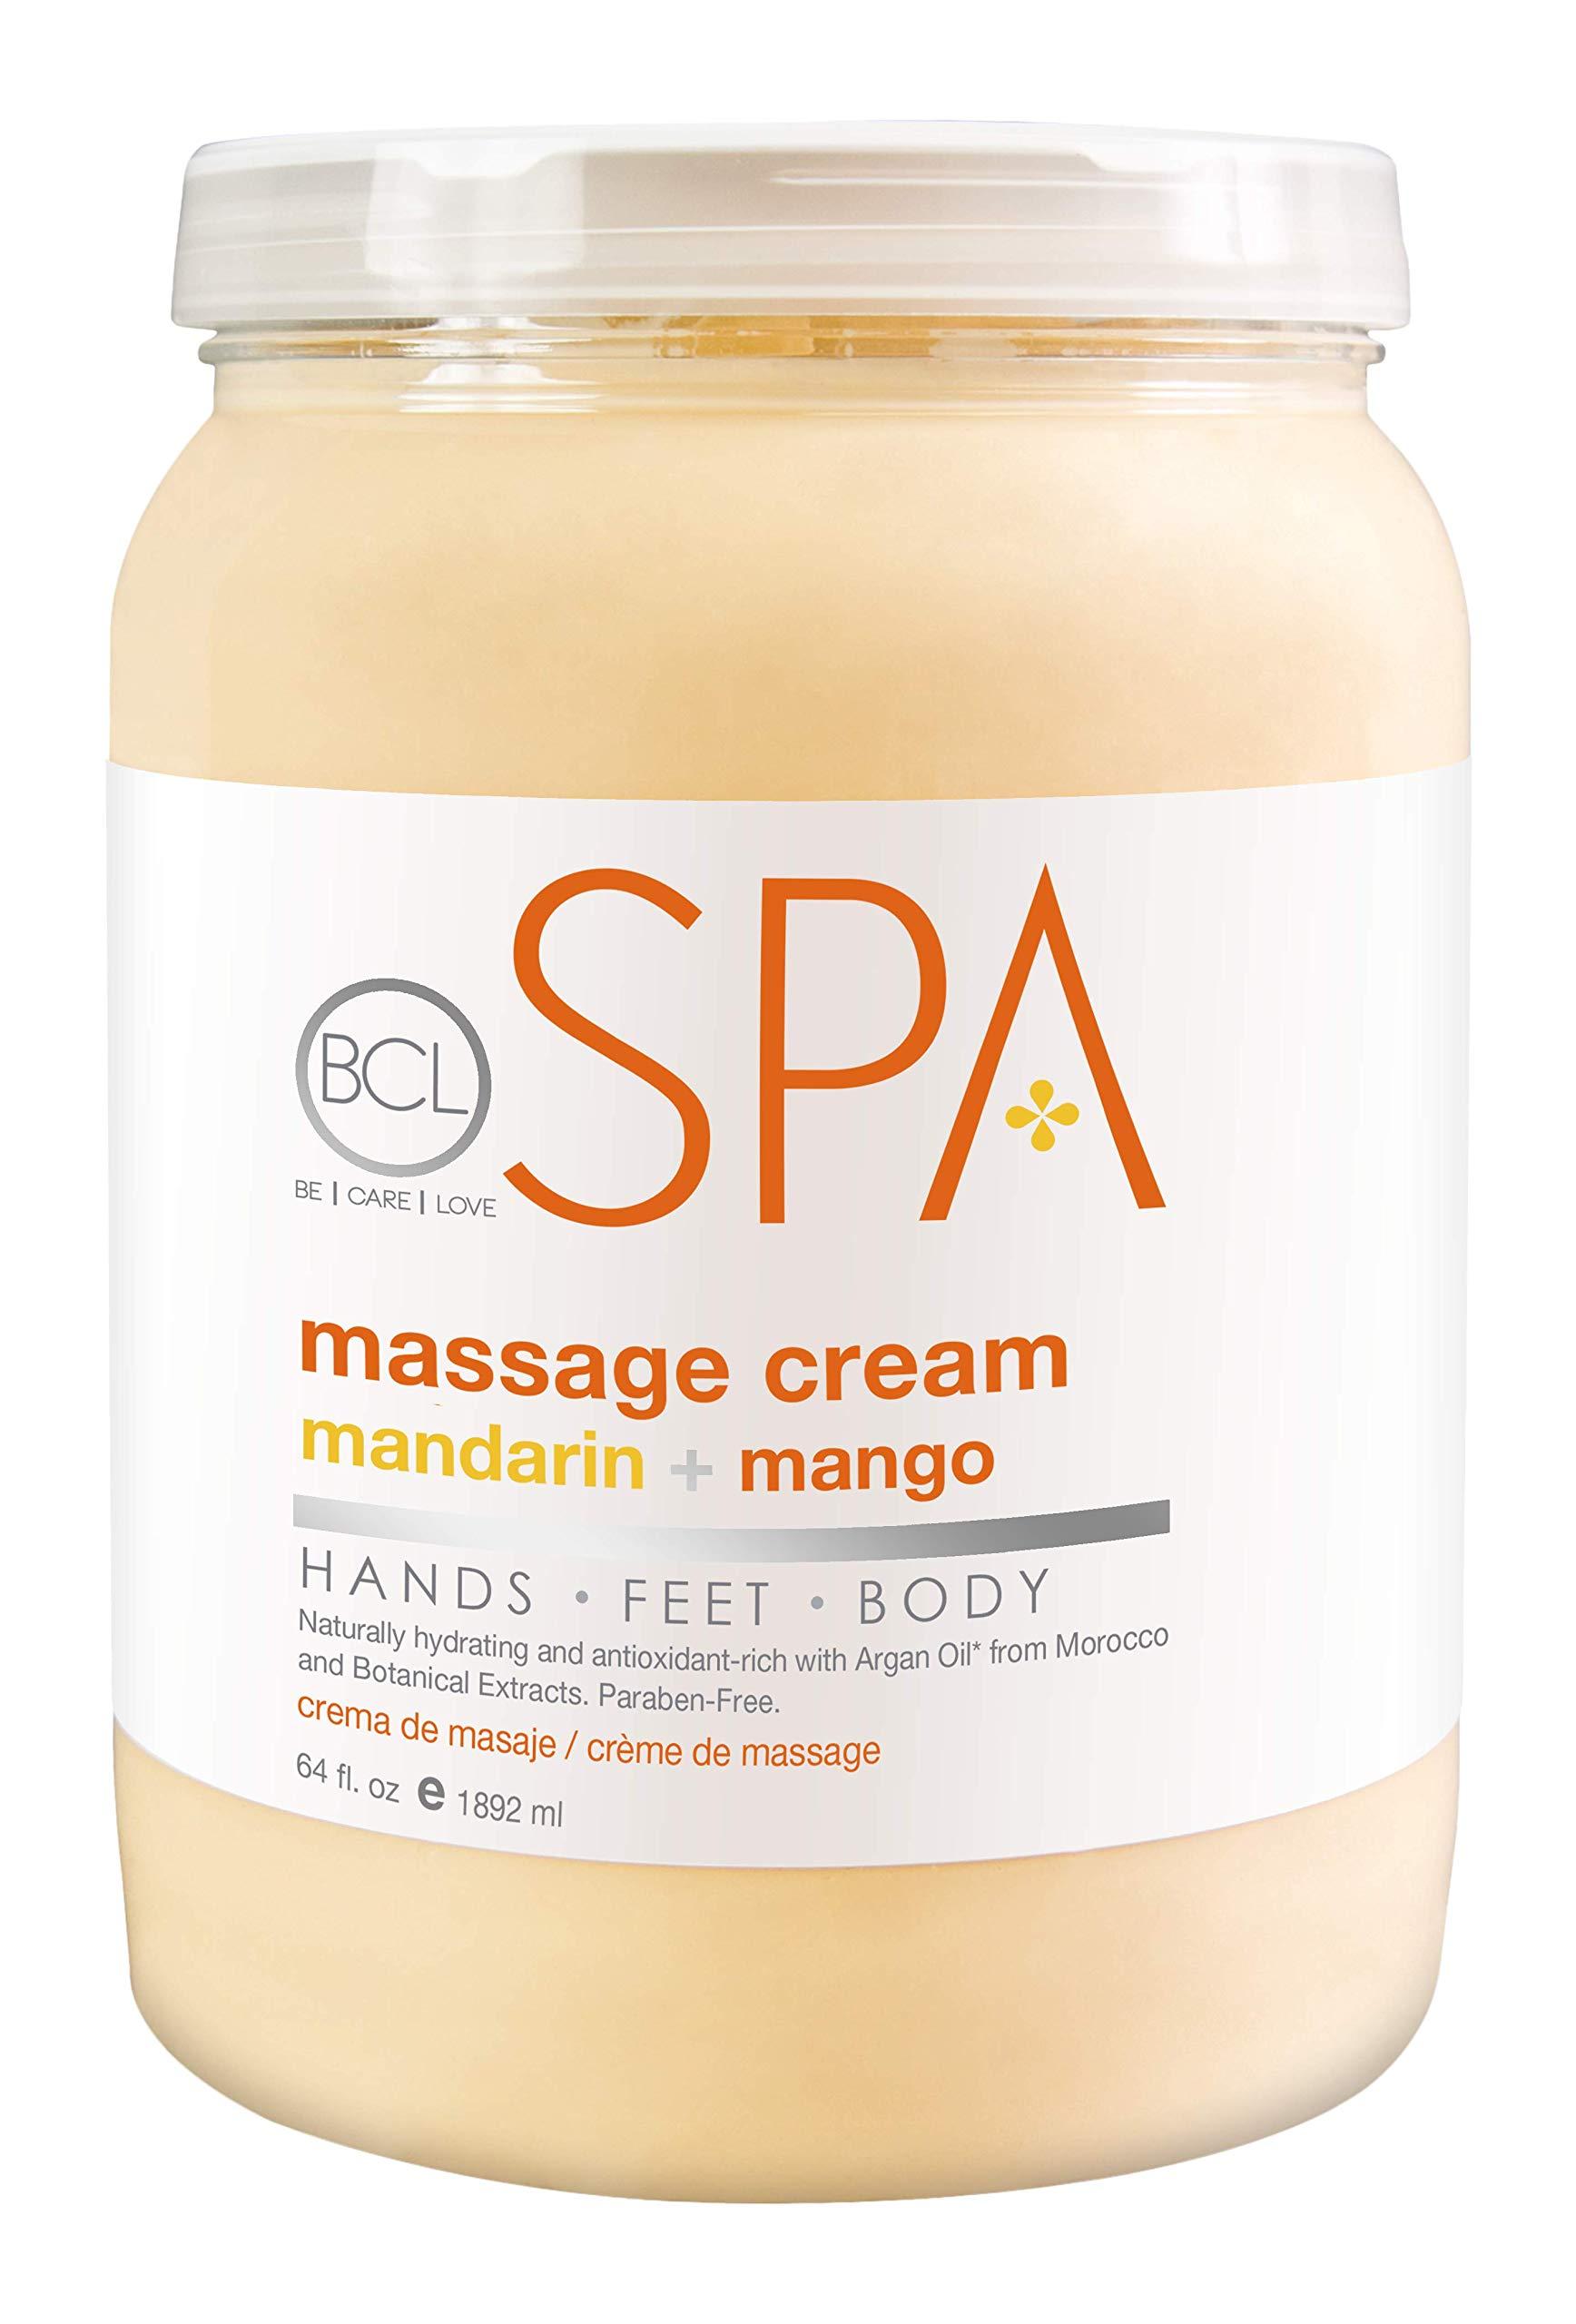 Bio Creative Lab BCL Spa Massage Cream, Mandarin and Mango, 64 Ounce